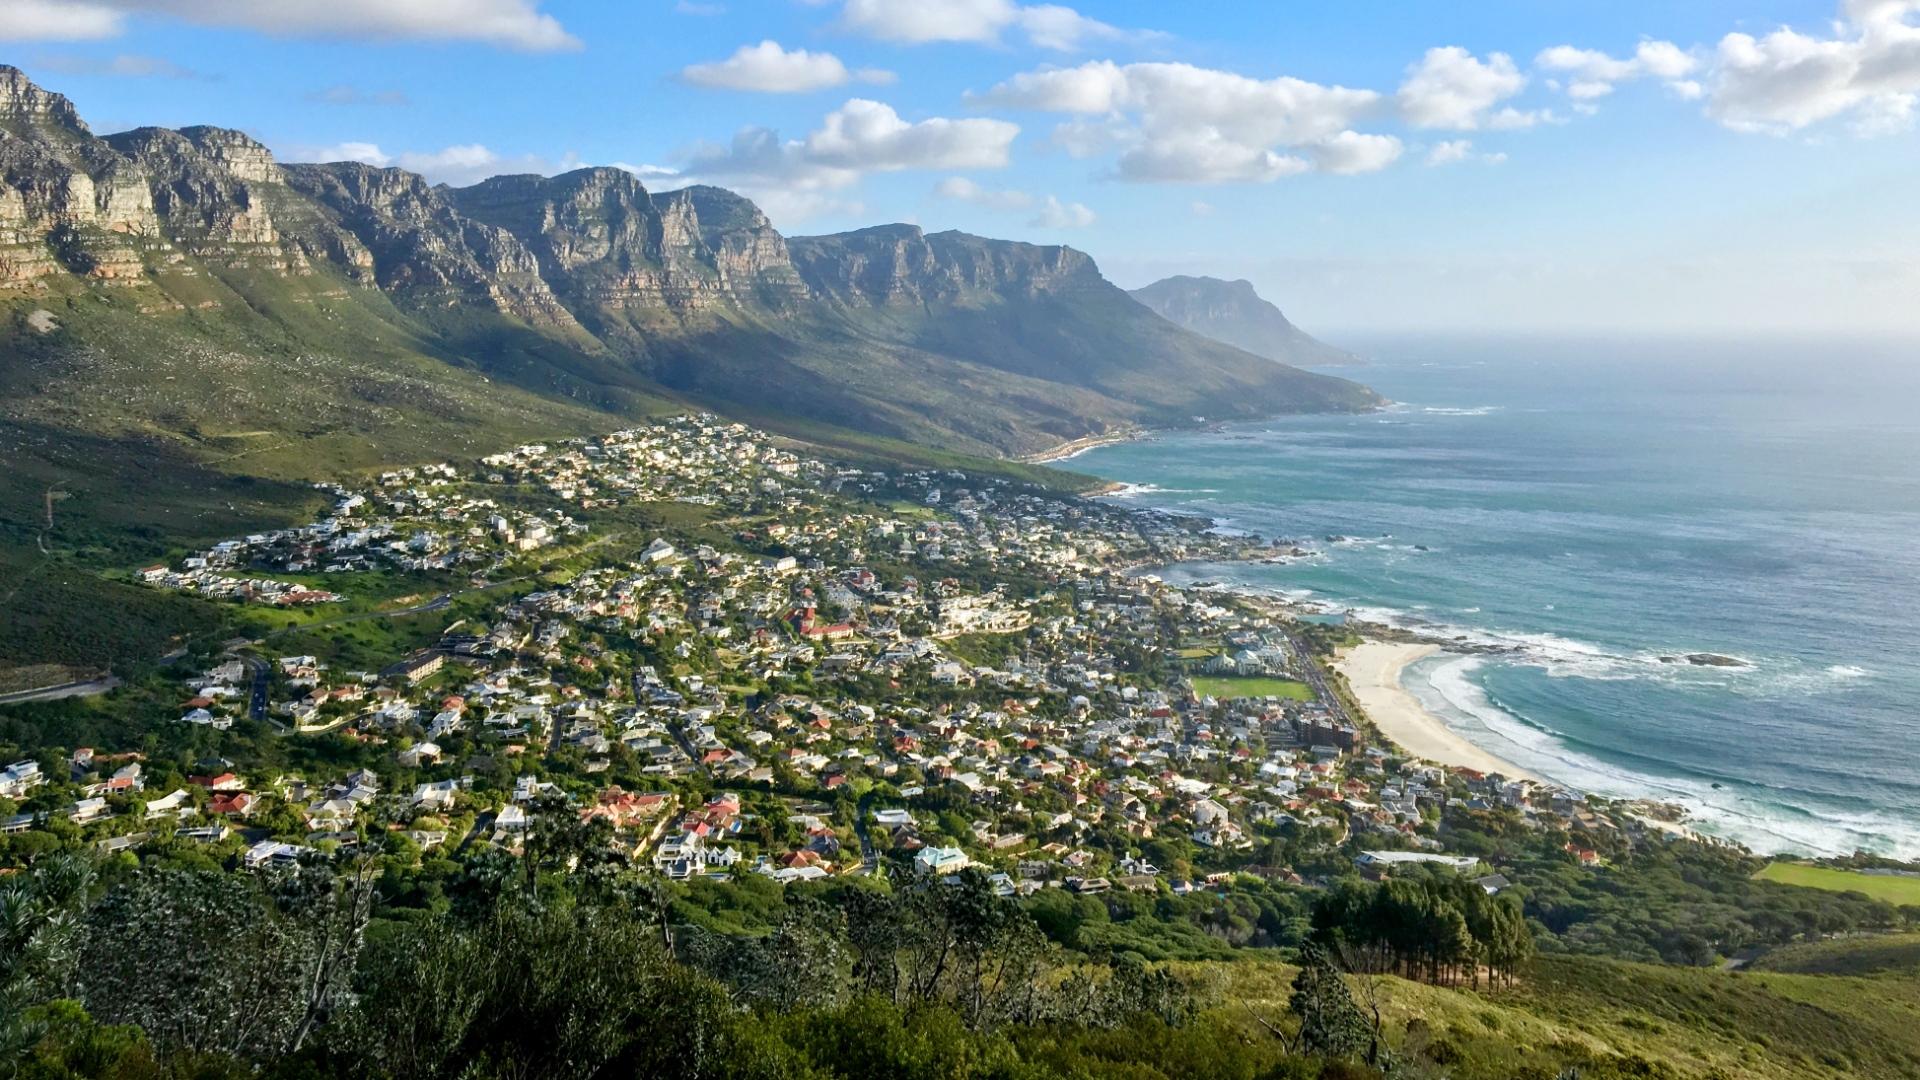 beste reistijd zuid-afrika